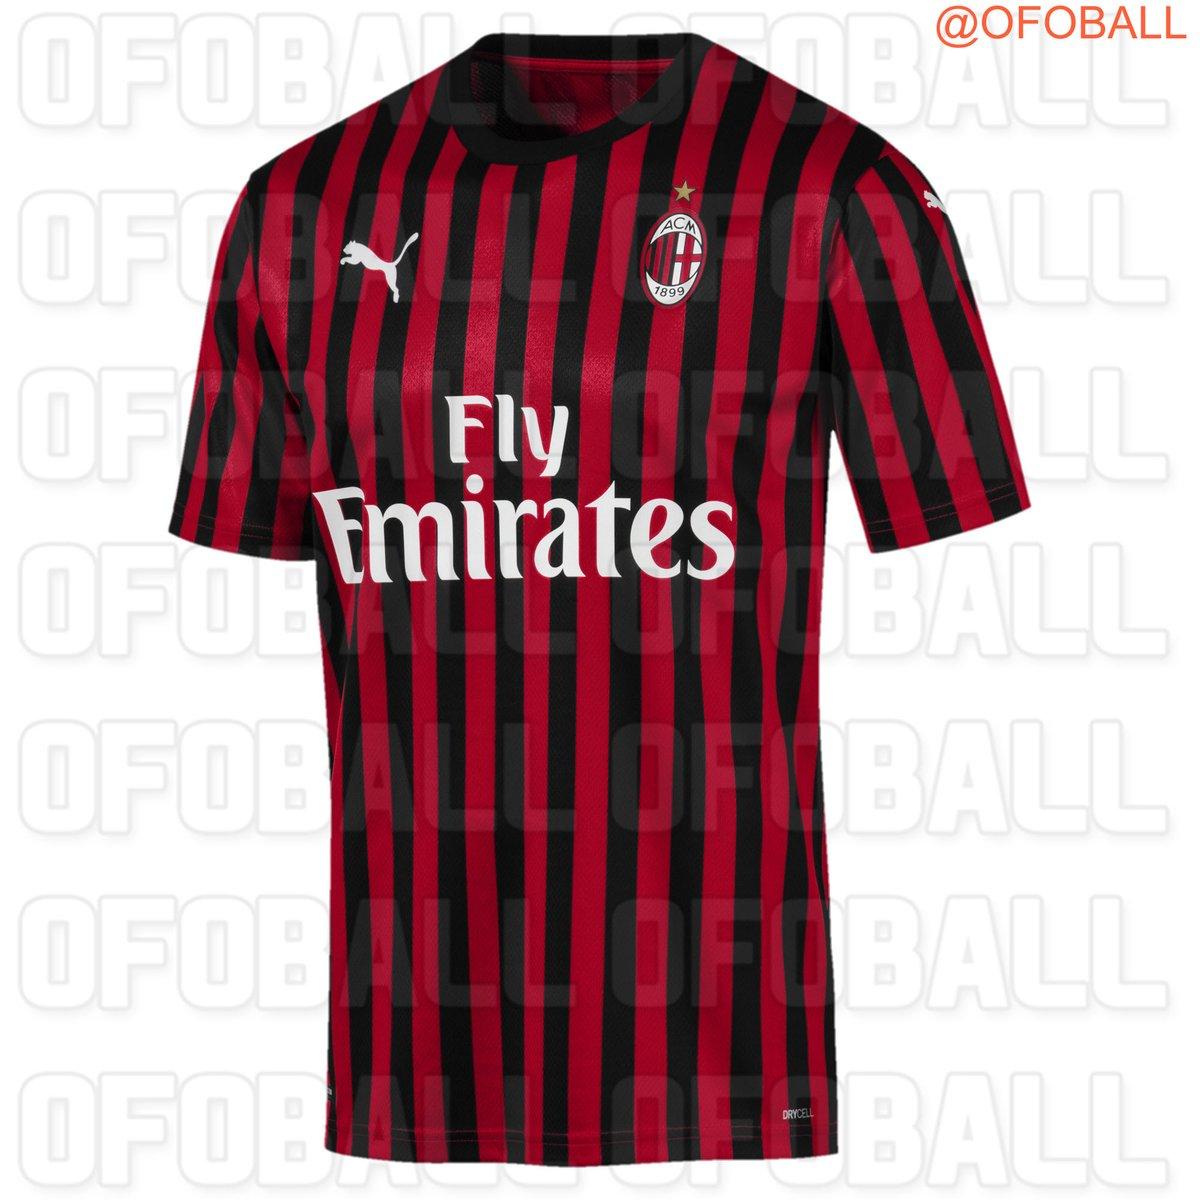 AC Milan 2020 maillot domicile Puma 19 20